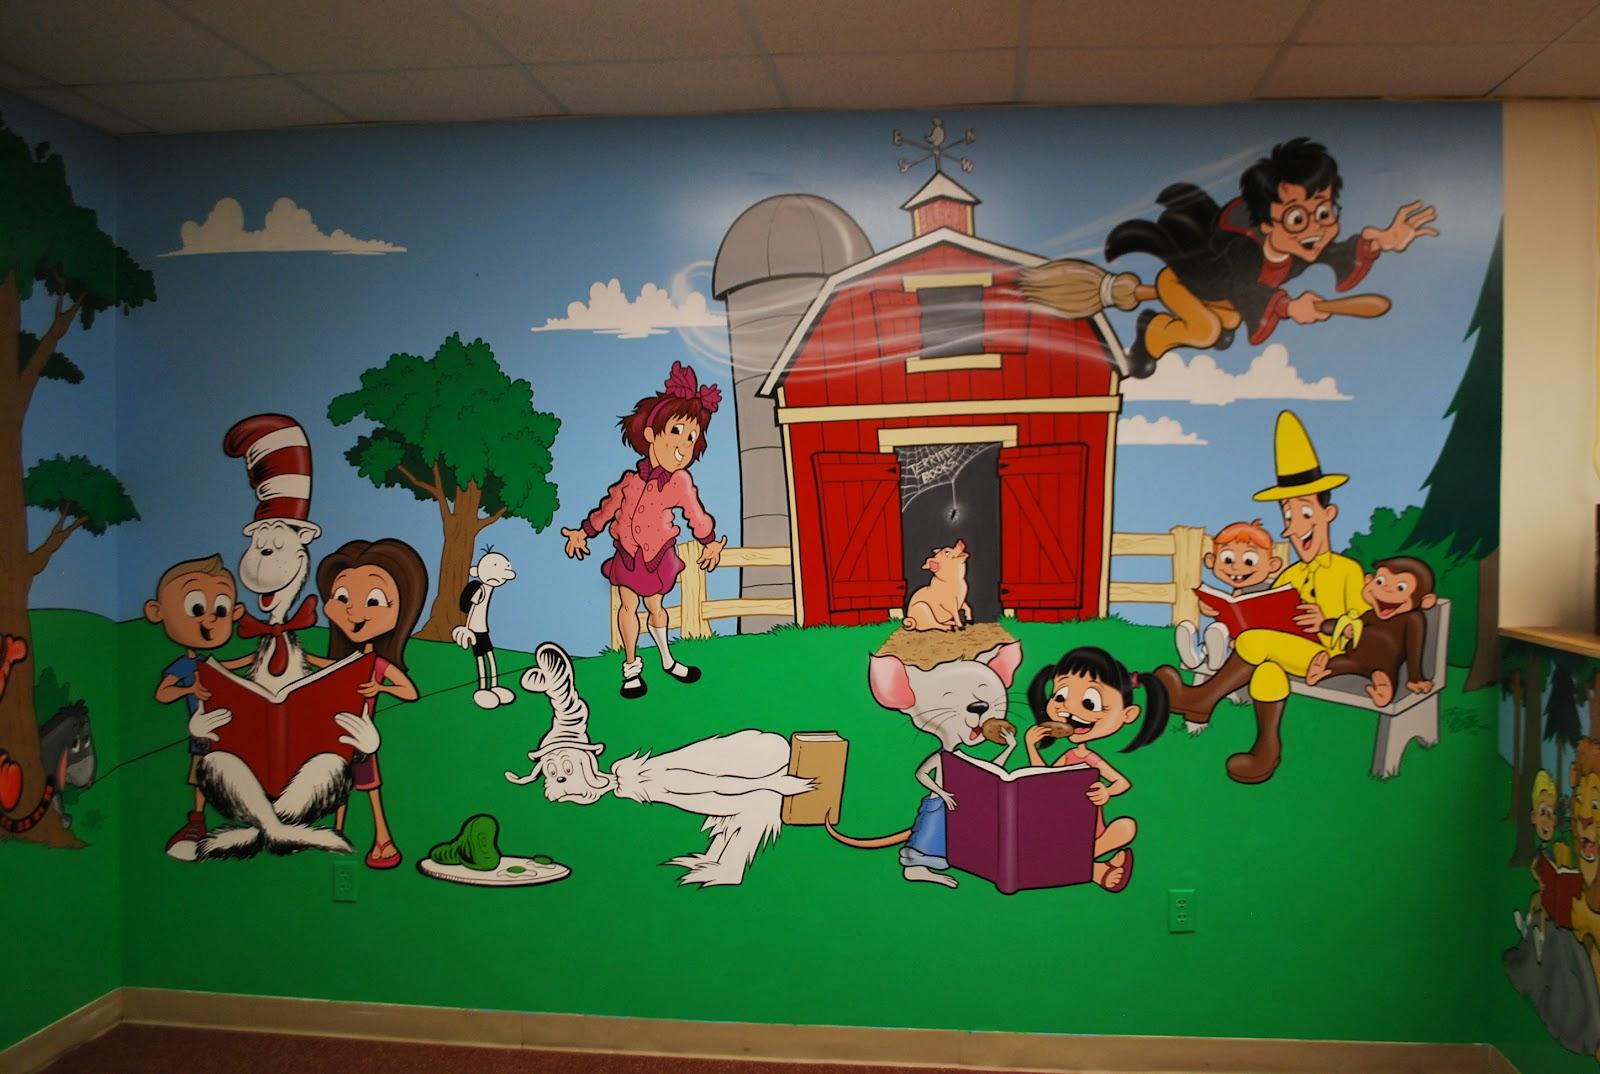 Russ mills illustration school library mural for Elementary school mural